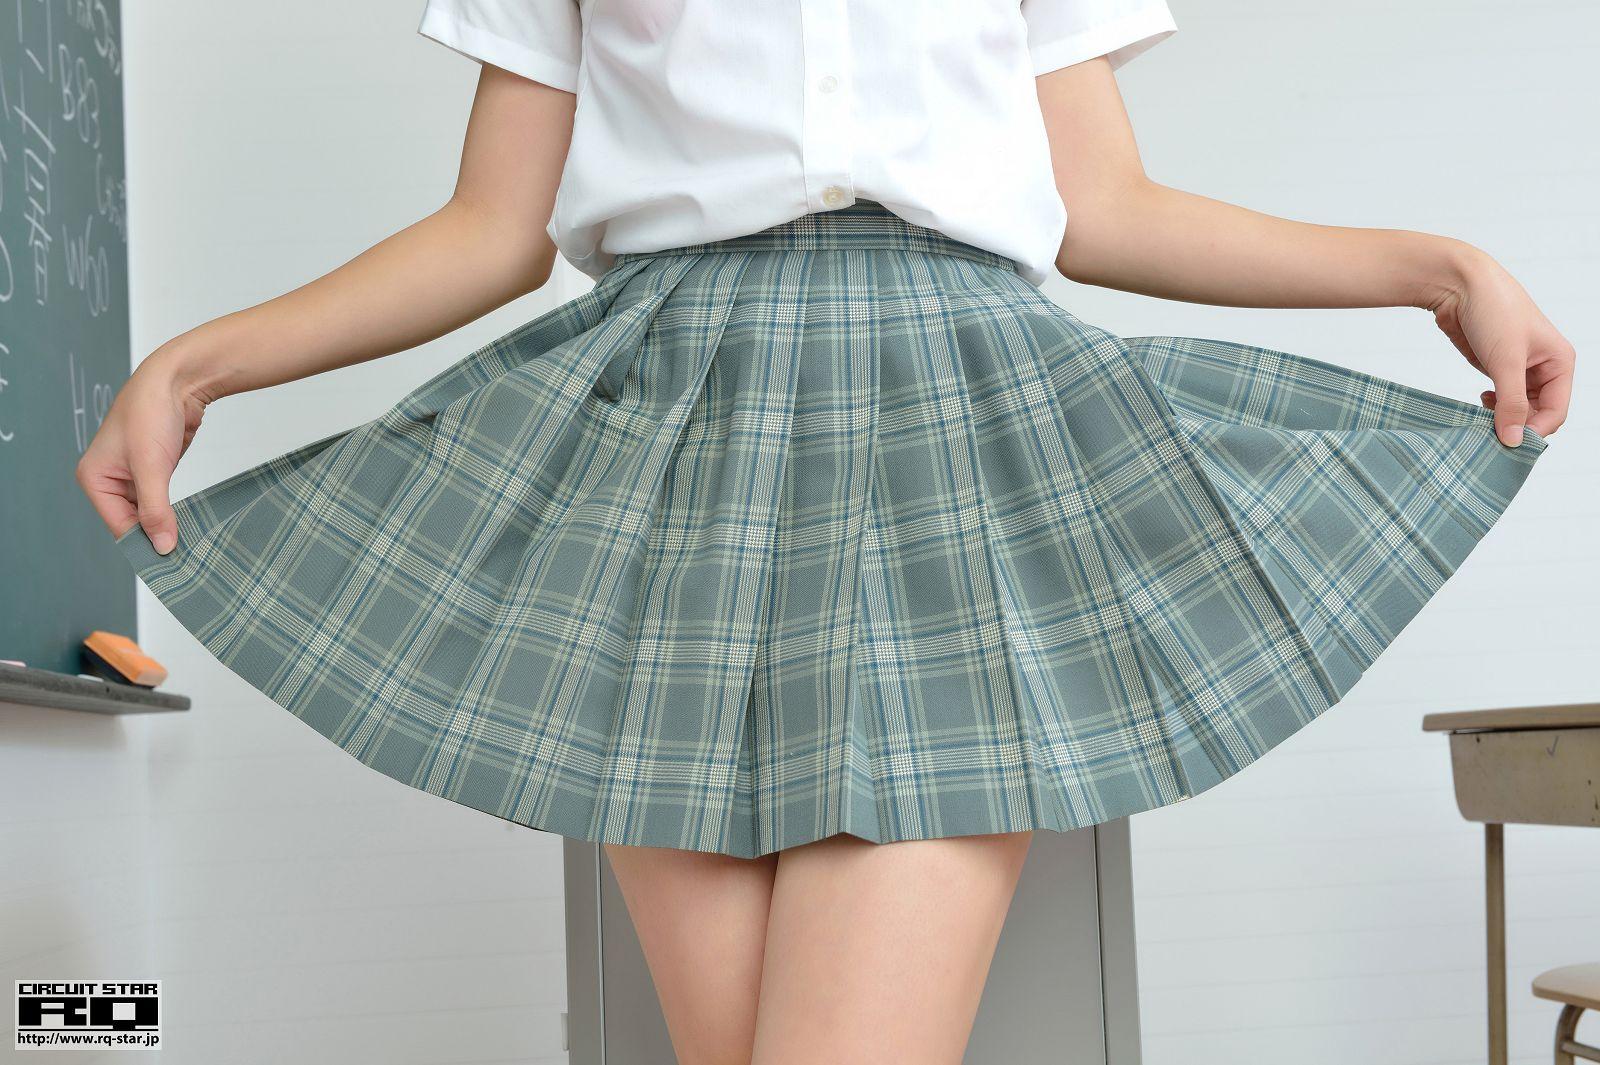 [RQ STAR美女] NO.00726 Natsuki Higurashi 日暮なつき School Girl Style[100P] RQ STAR 第4张